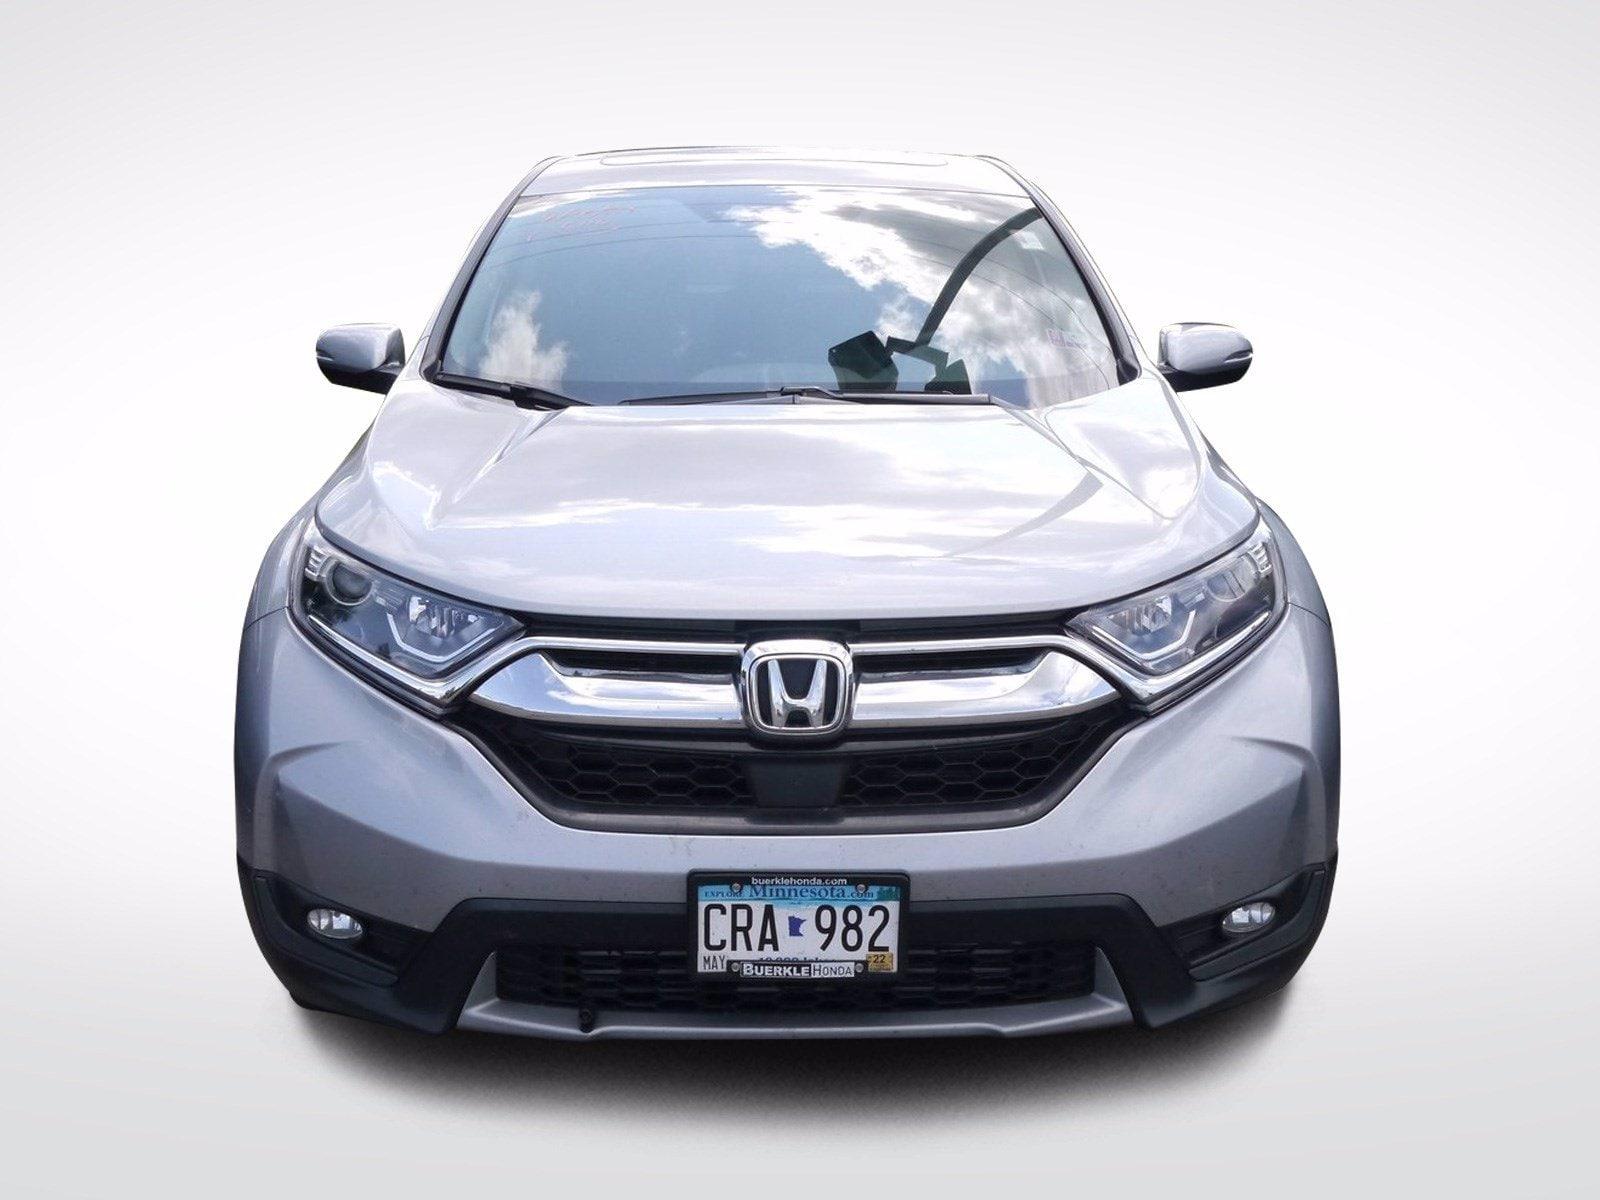 Used 2019 Honda CR-V EX with VIN 5J6RW2H50KA002307 for sale in Baxter, Minnesota